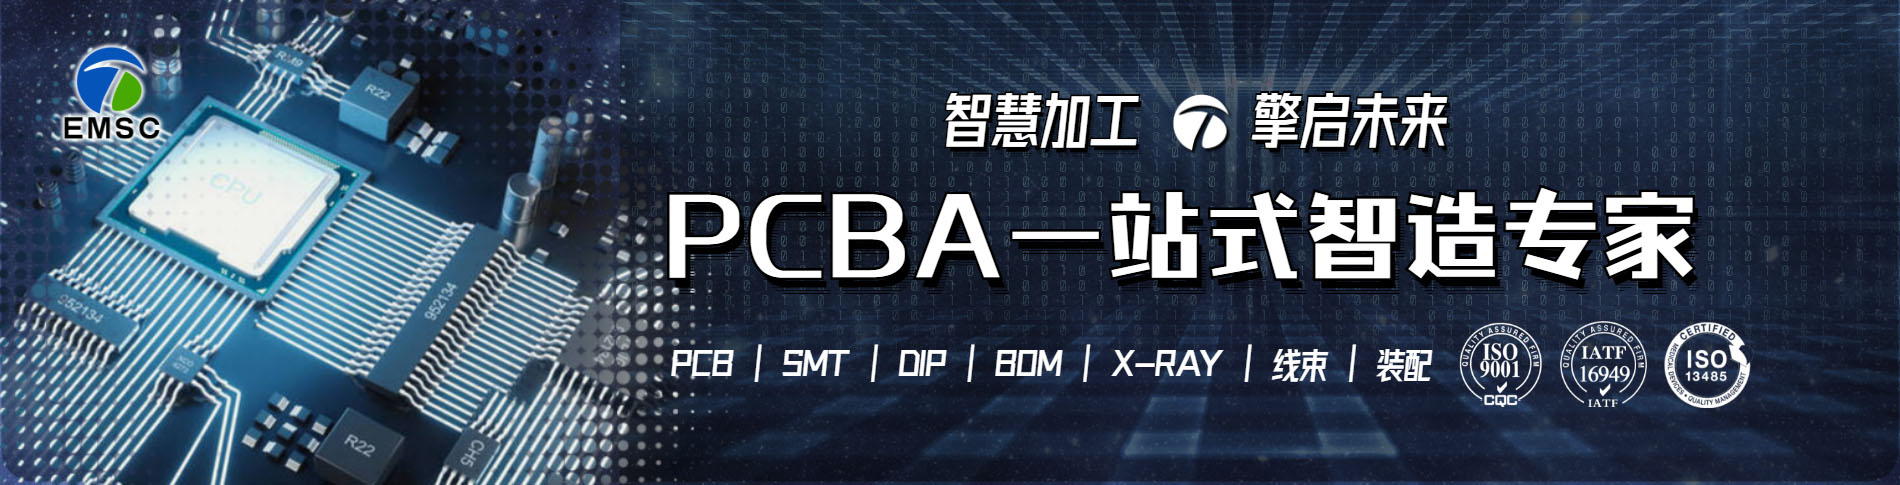 PCBA一站式智造专家